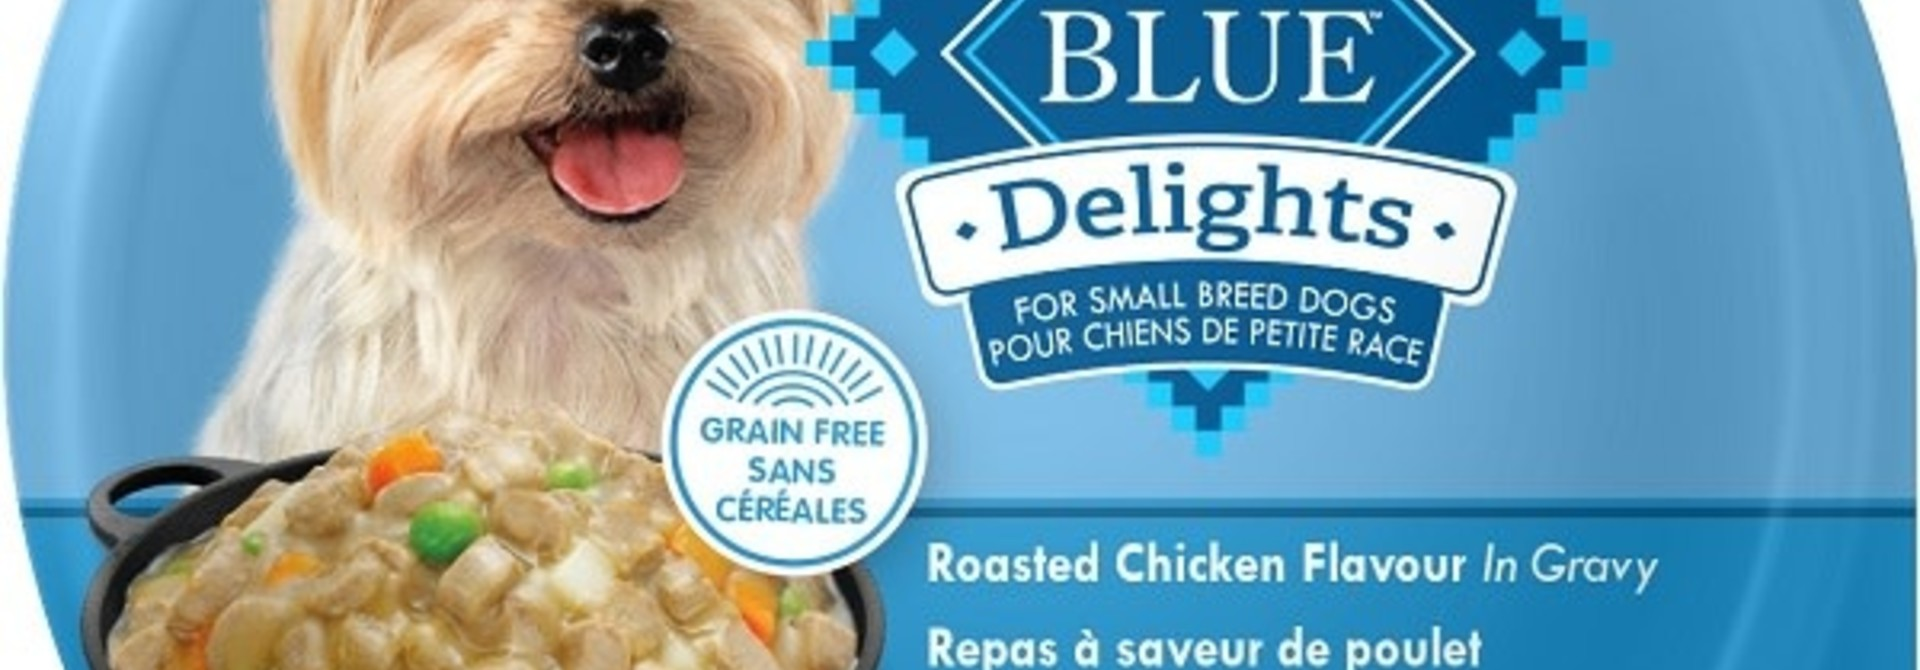 BLUE DELIGHTS SmBreed Rotisserie Ckn 3.5oz